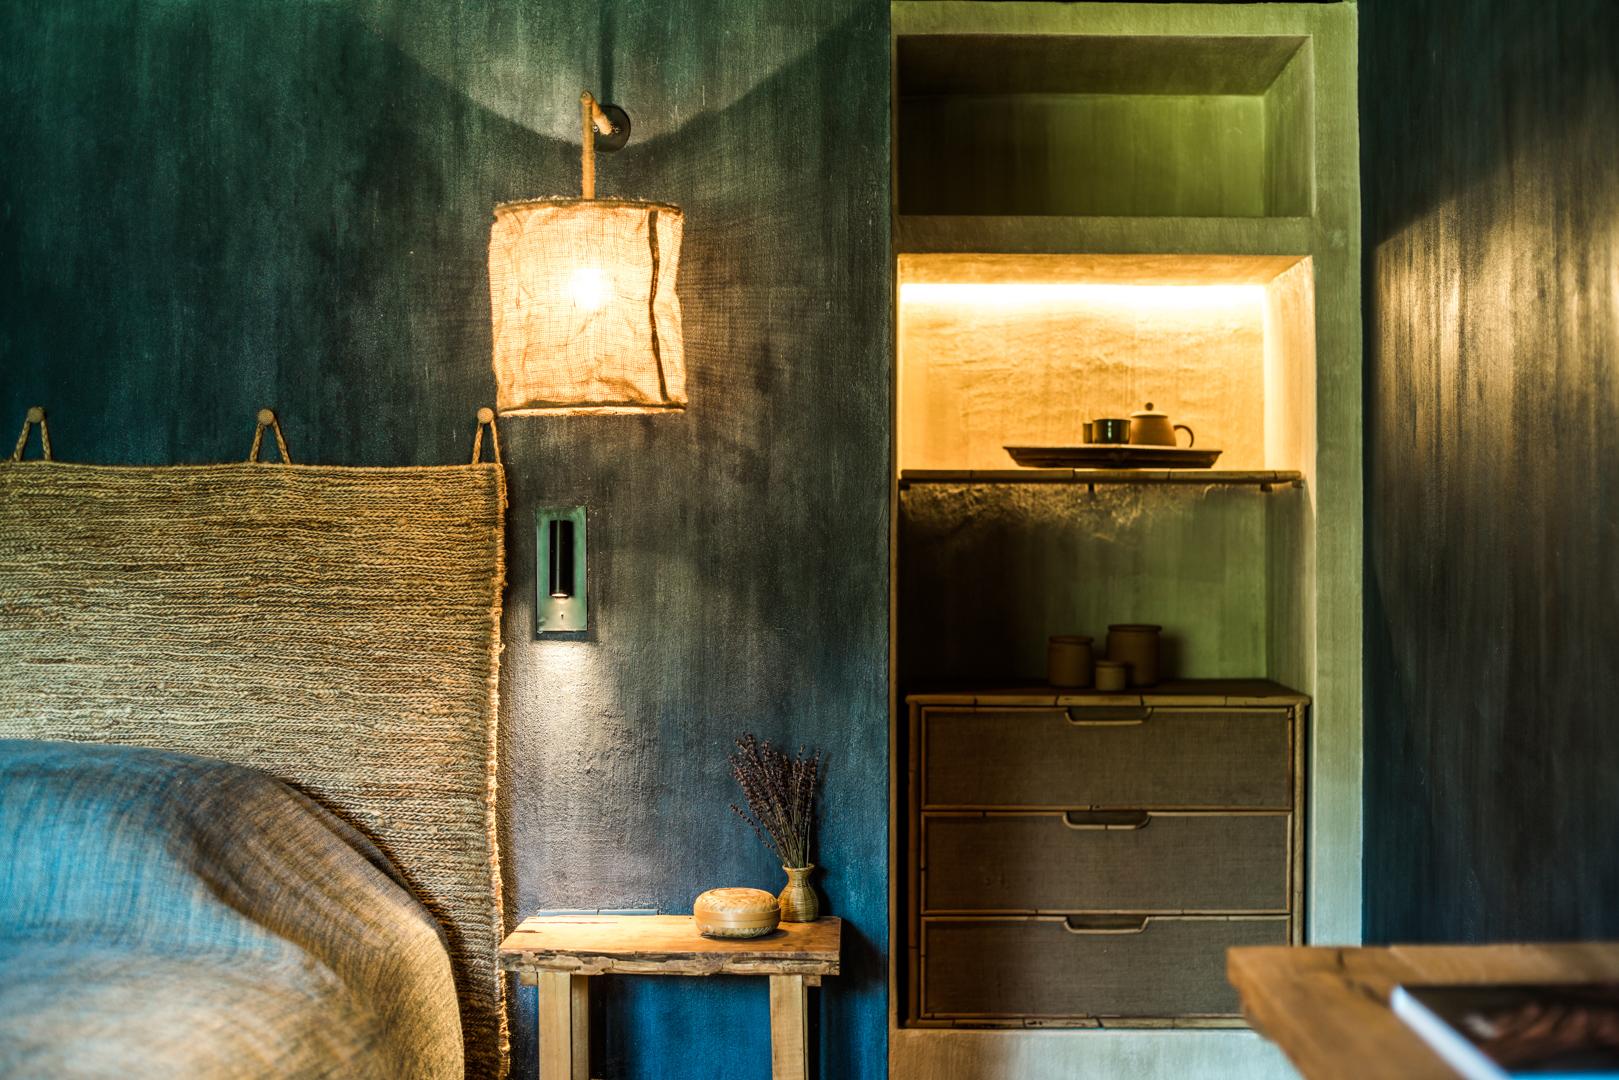 Zannier-Hotels-Bãi-San-Hô-Paddy-Field-Villa-6-©-Frederik-Wissink-for-Zannier-Hotels